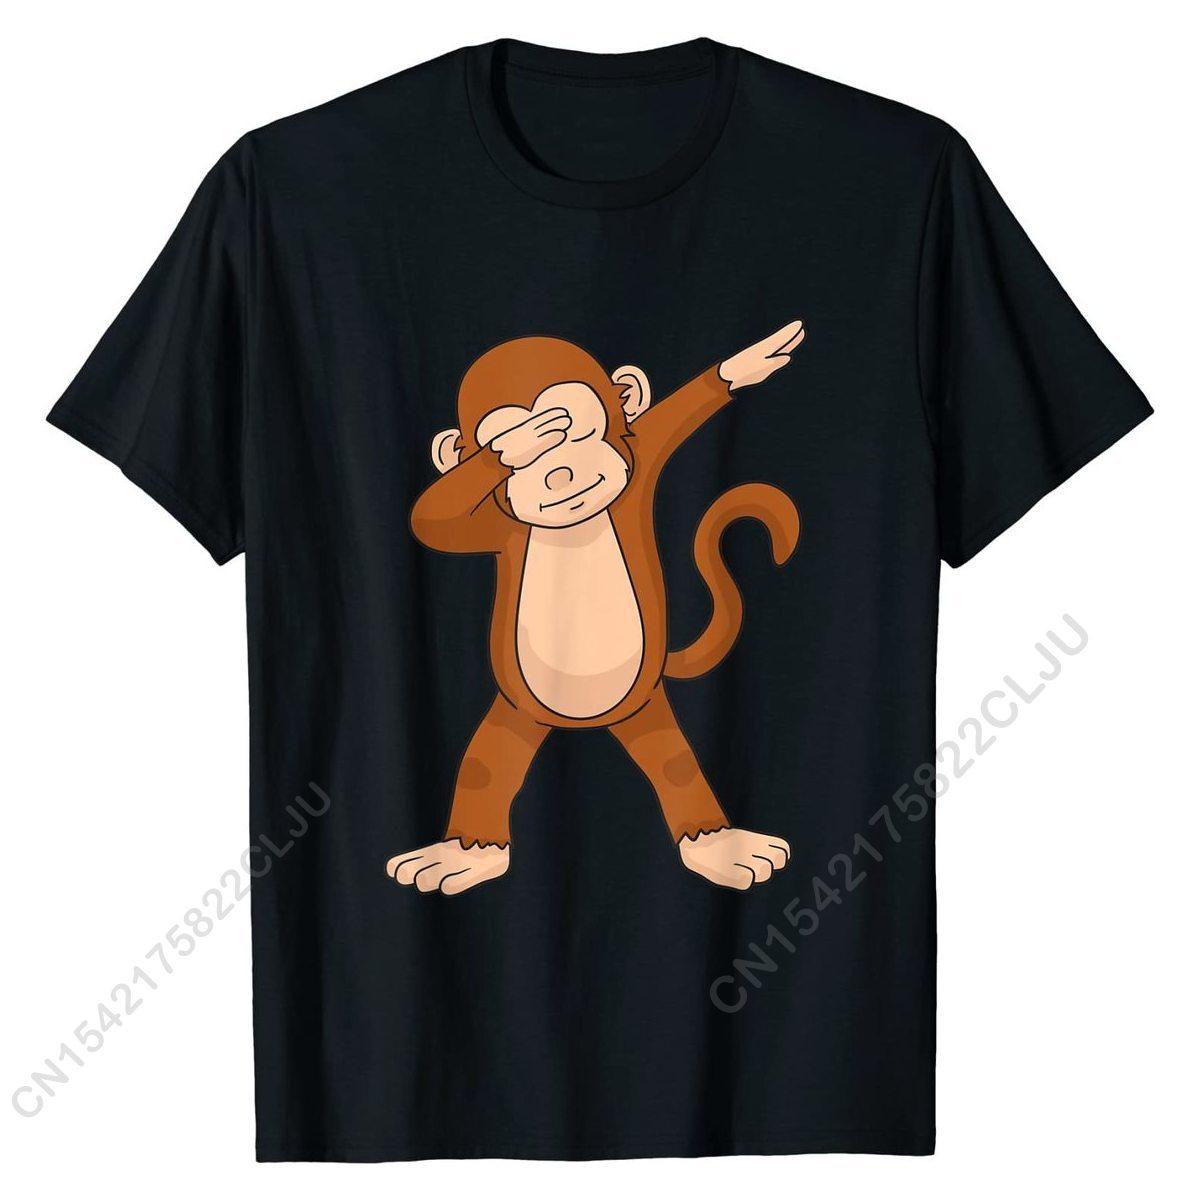 Dabbing Monkey T-Shirt Funny Dab Gift T-Shirt T Shirt T Shirt Cute Cotton Casual Design Men's khaki crushed velvet flounced design t shirt sweatpant bundle